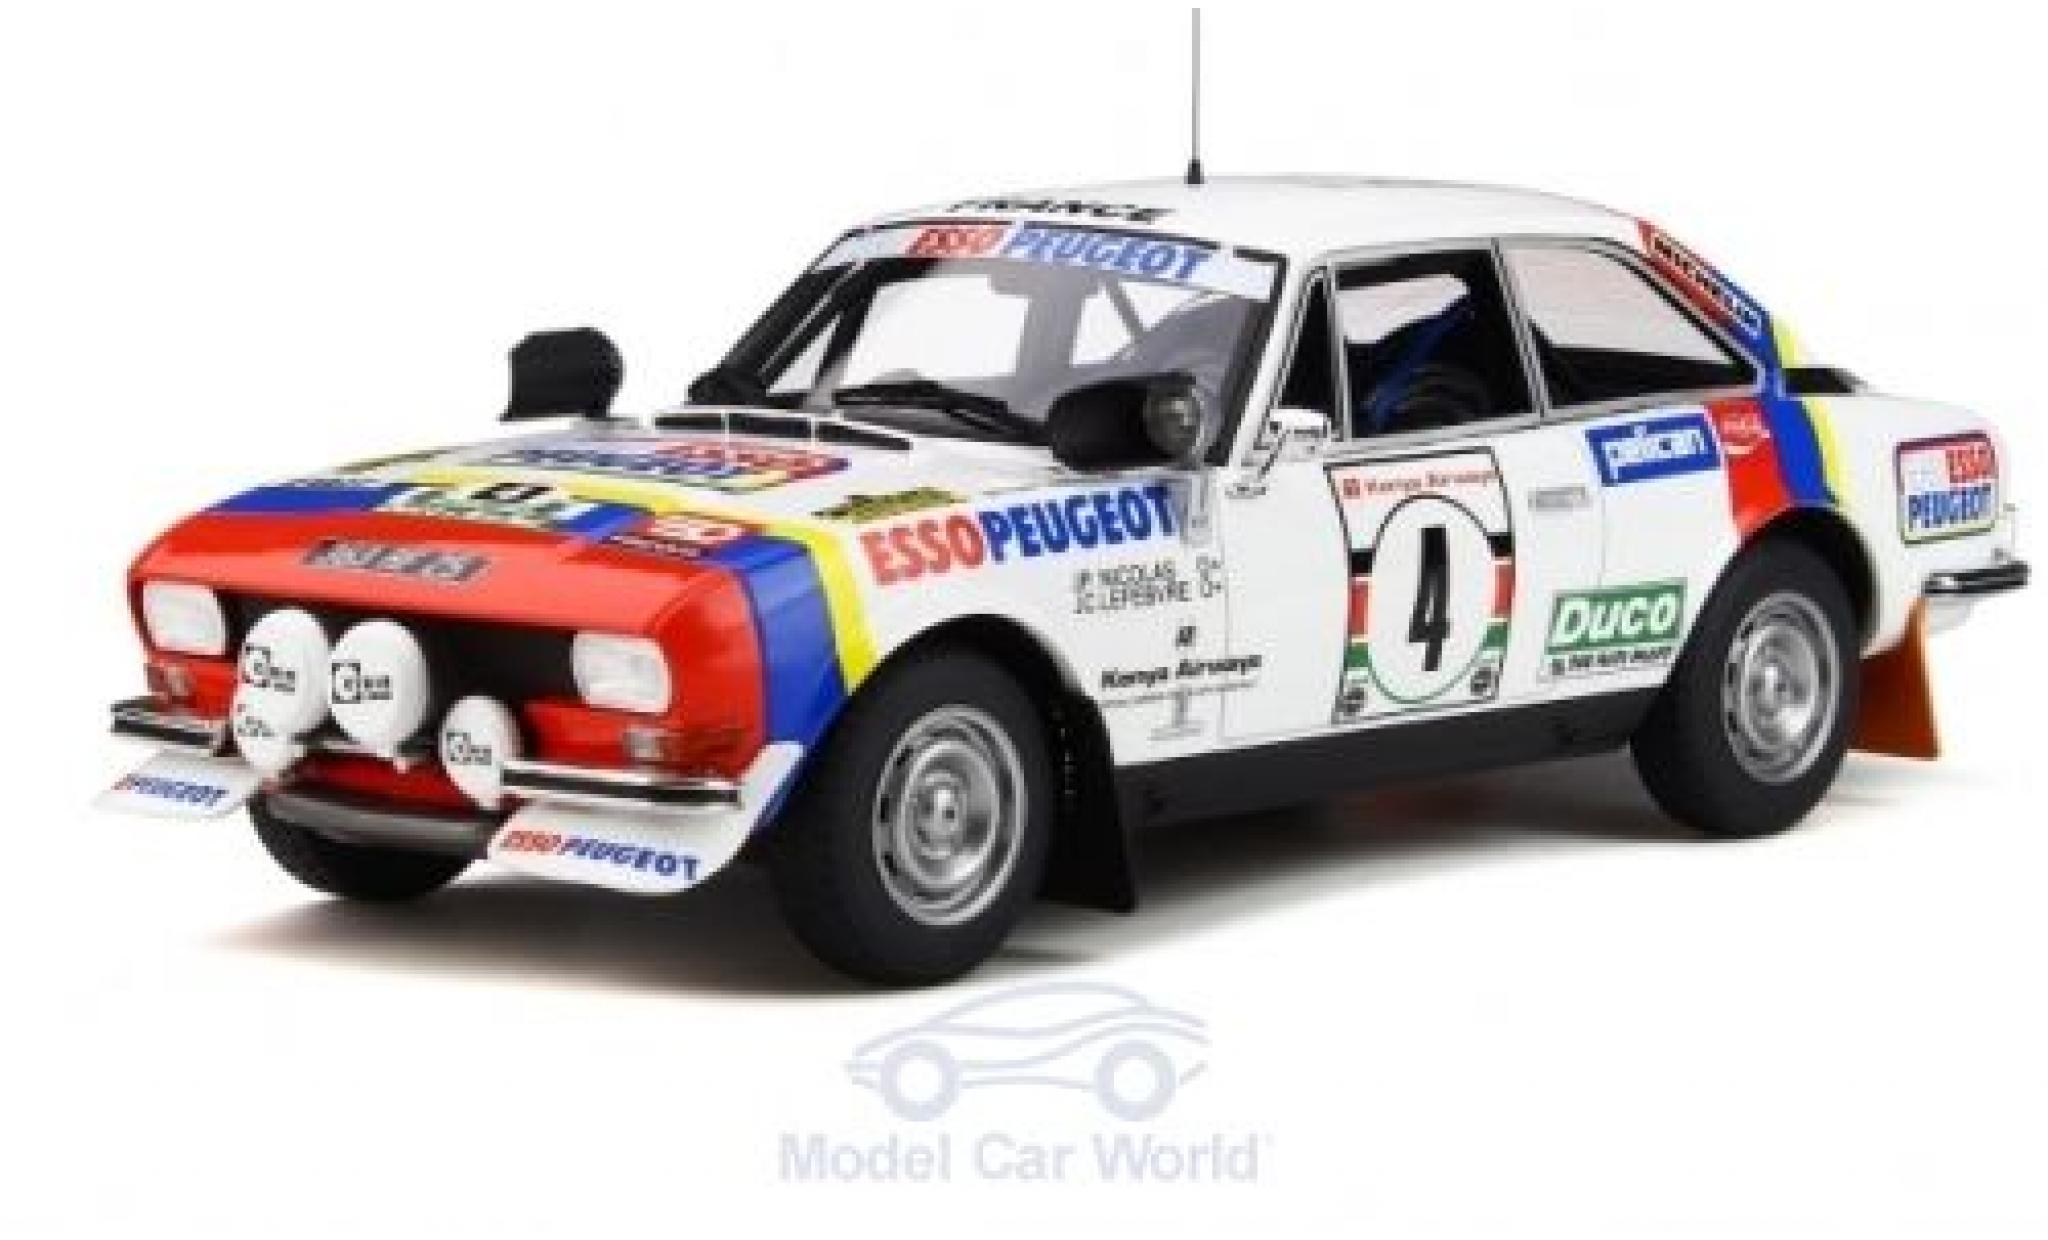 Peugeot 504 1/18 Ottomobile Gr.4 Coupe V6 No.4 Rallye WM Safari Rallye 1978 J.P.Nicolas/J.C.Lefebvre